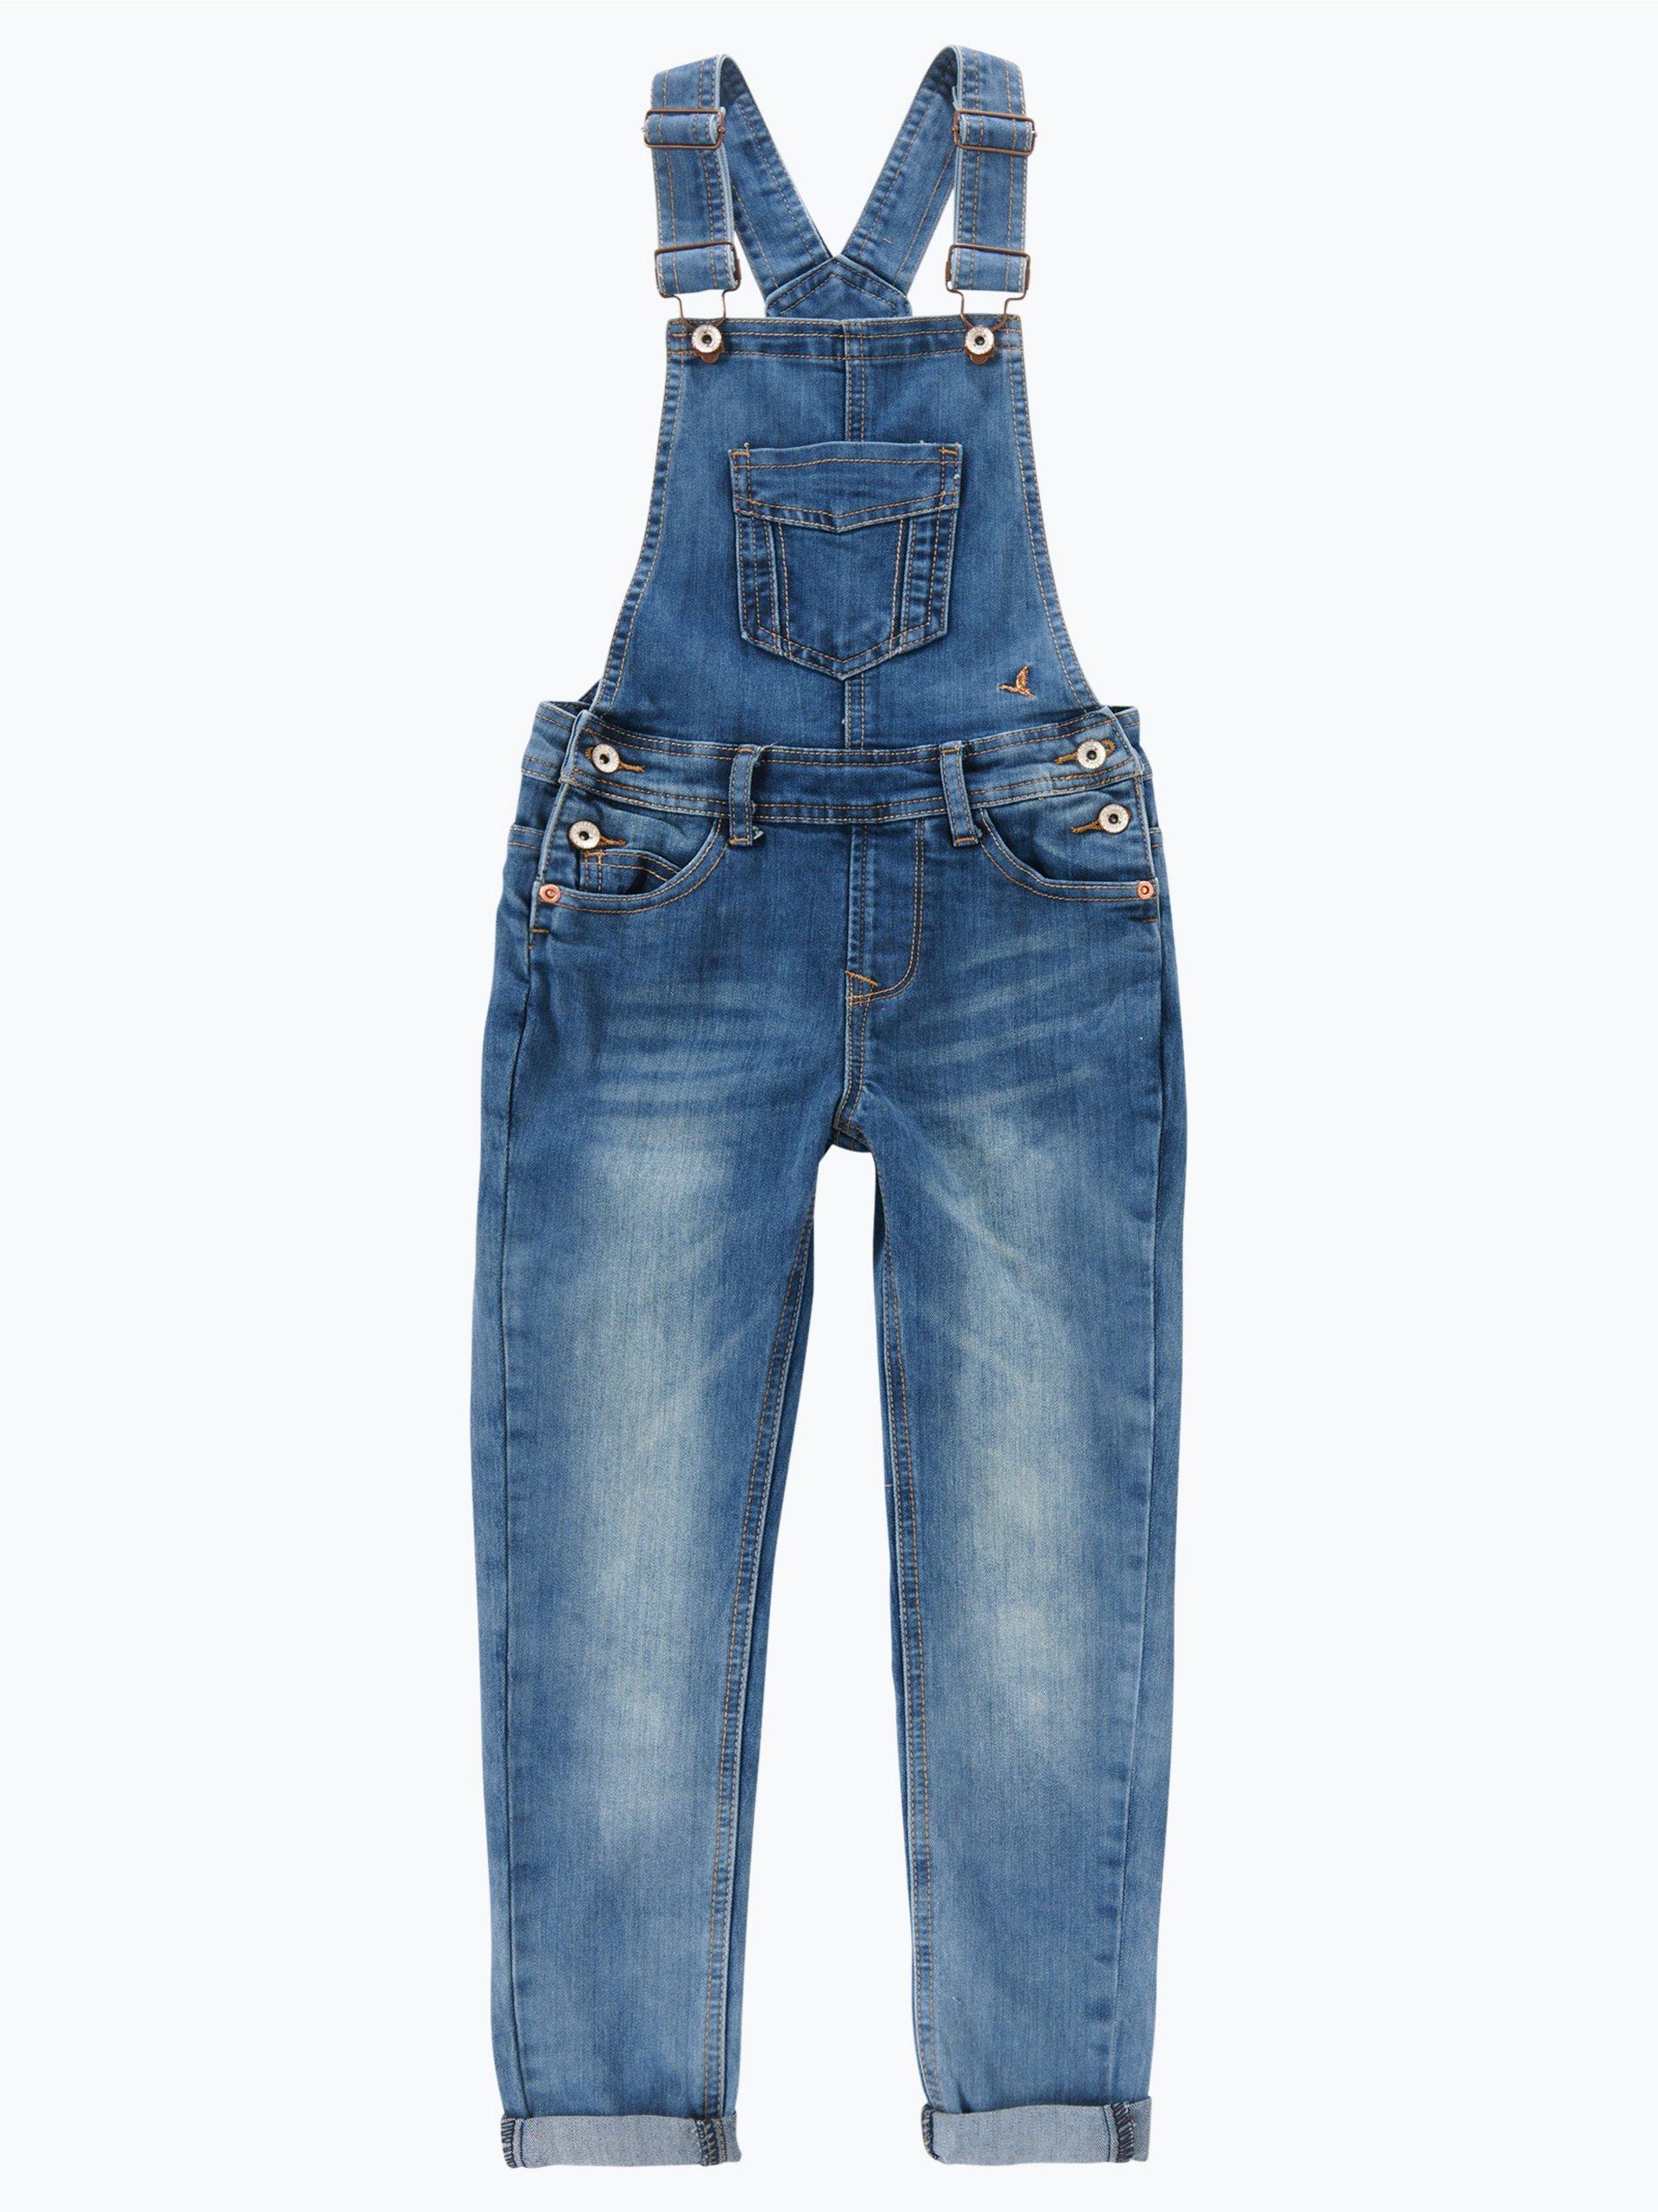 jonas nielsen stockholm m dchen jeans latzhose indigo uni online kaufen peek und cloppenburg de. Black Bedroom Furniture Sets. Home Design Ideas